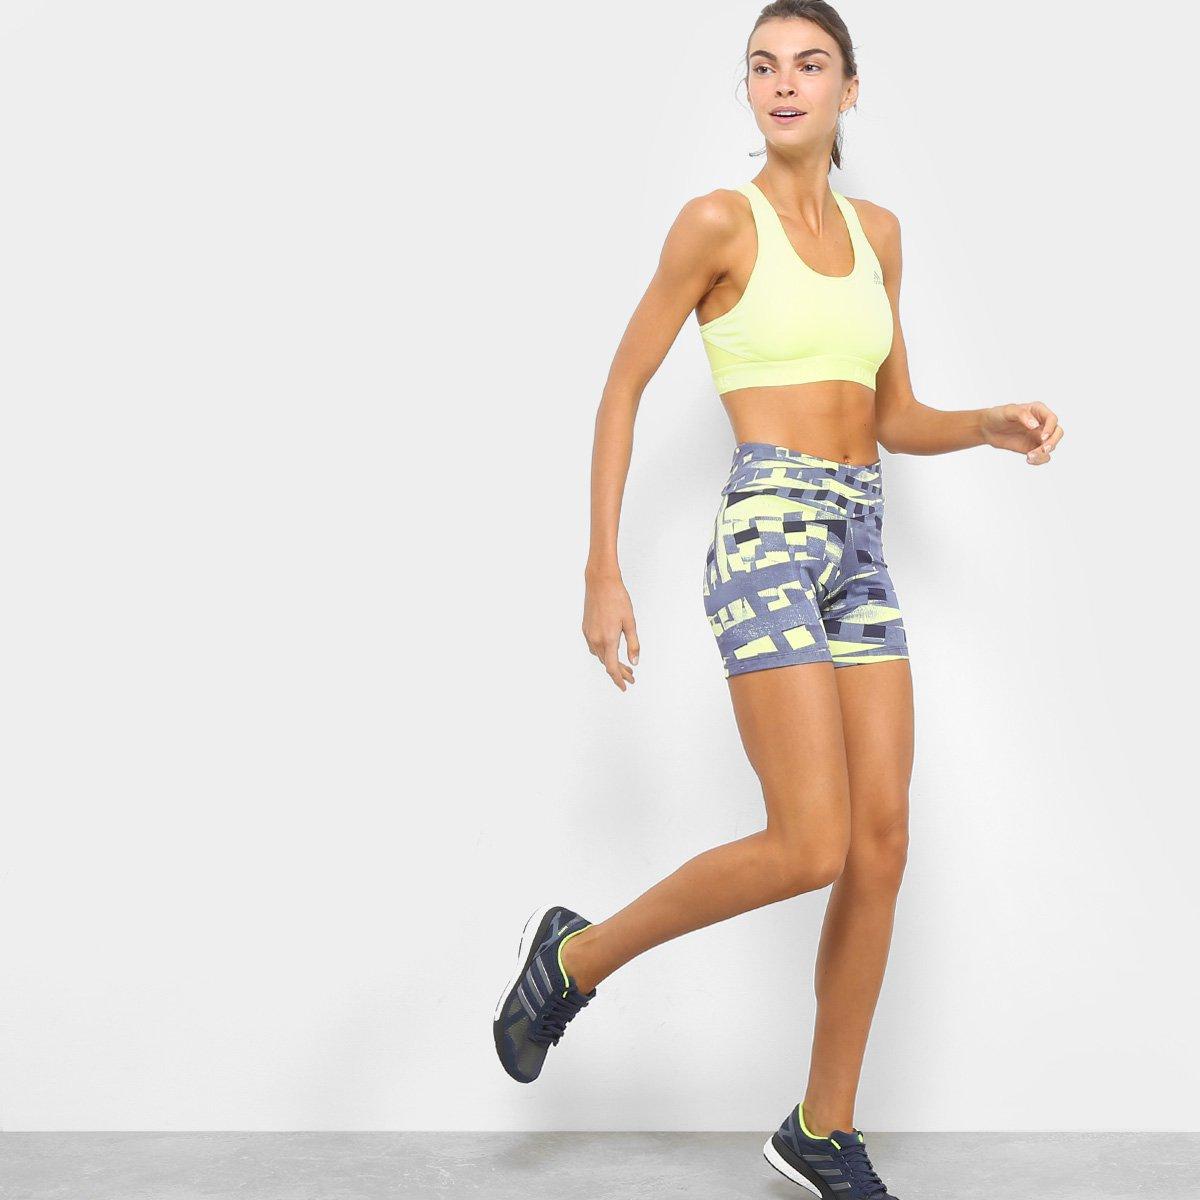 Adidas TechFit Amarelo Preto Adidas Bermuda Feminina Bermuda e Estampada xPFEPIUw